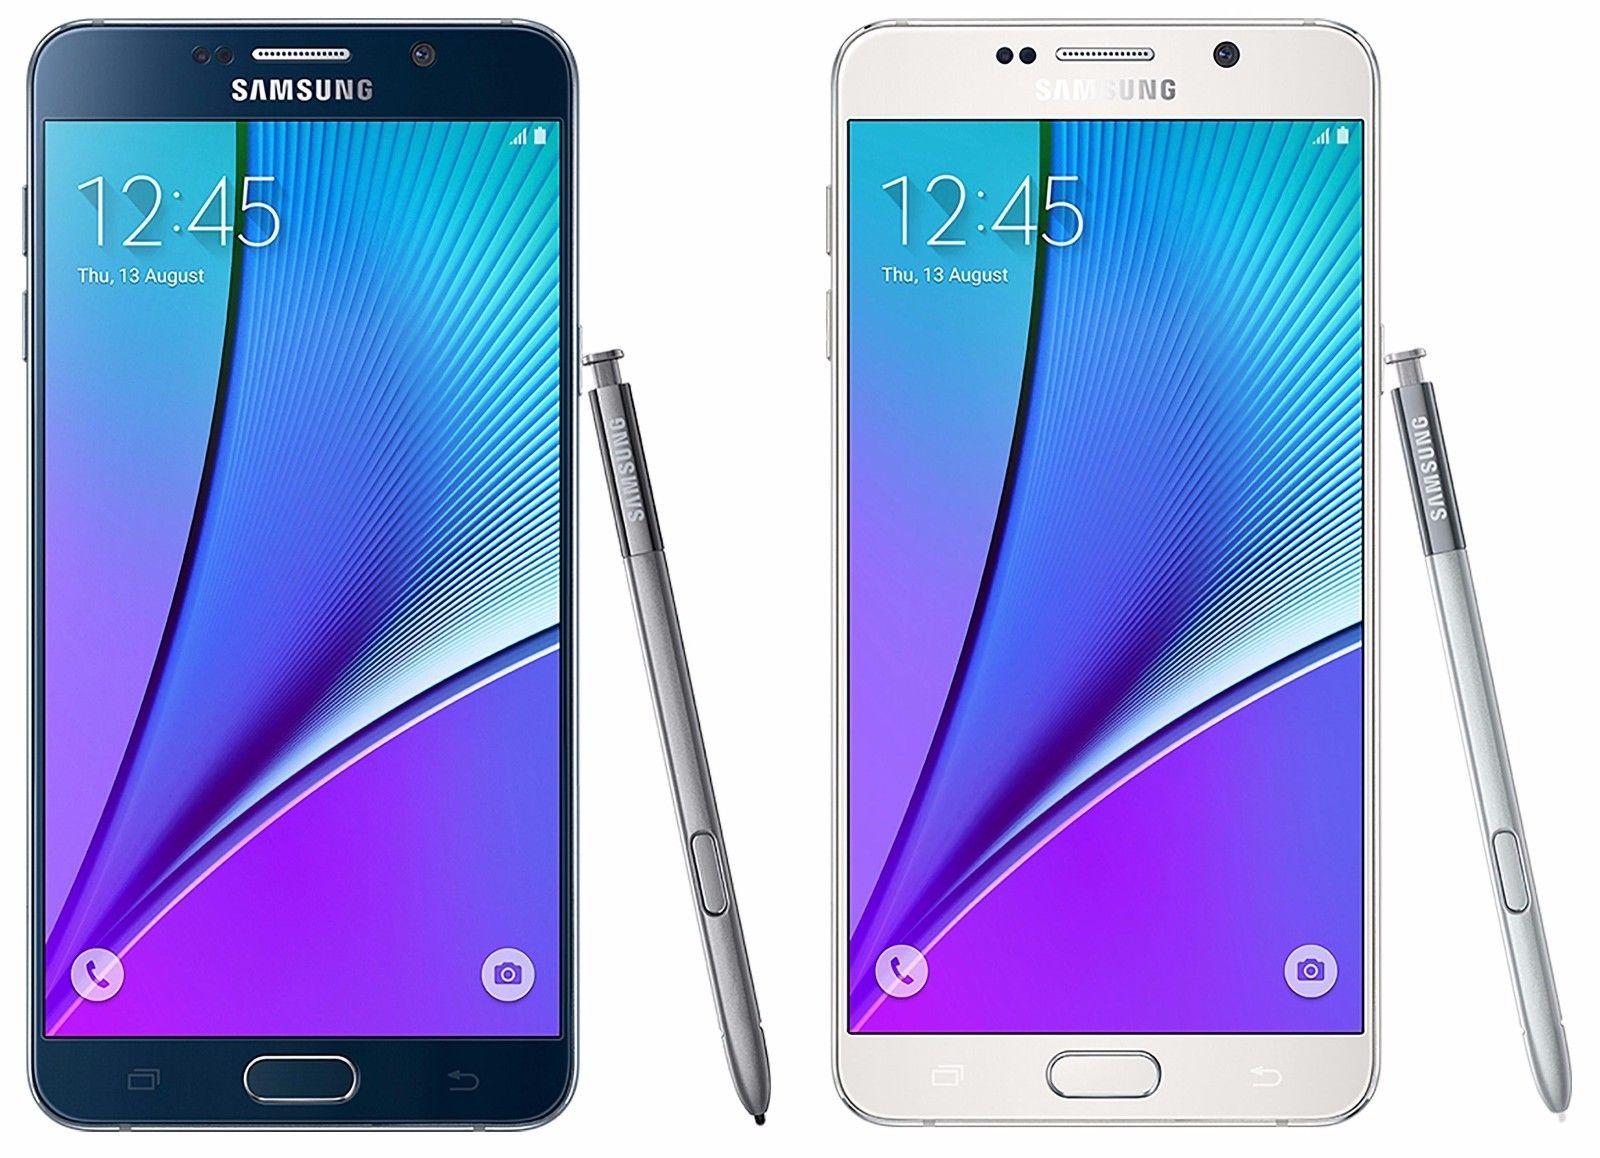 32GB Samsung Galaxy Note 5 Unlocked LTE Smartphone (Int'l Model)  $550 + Free Shipping